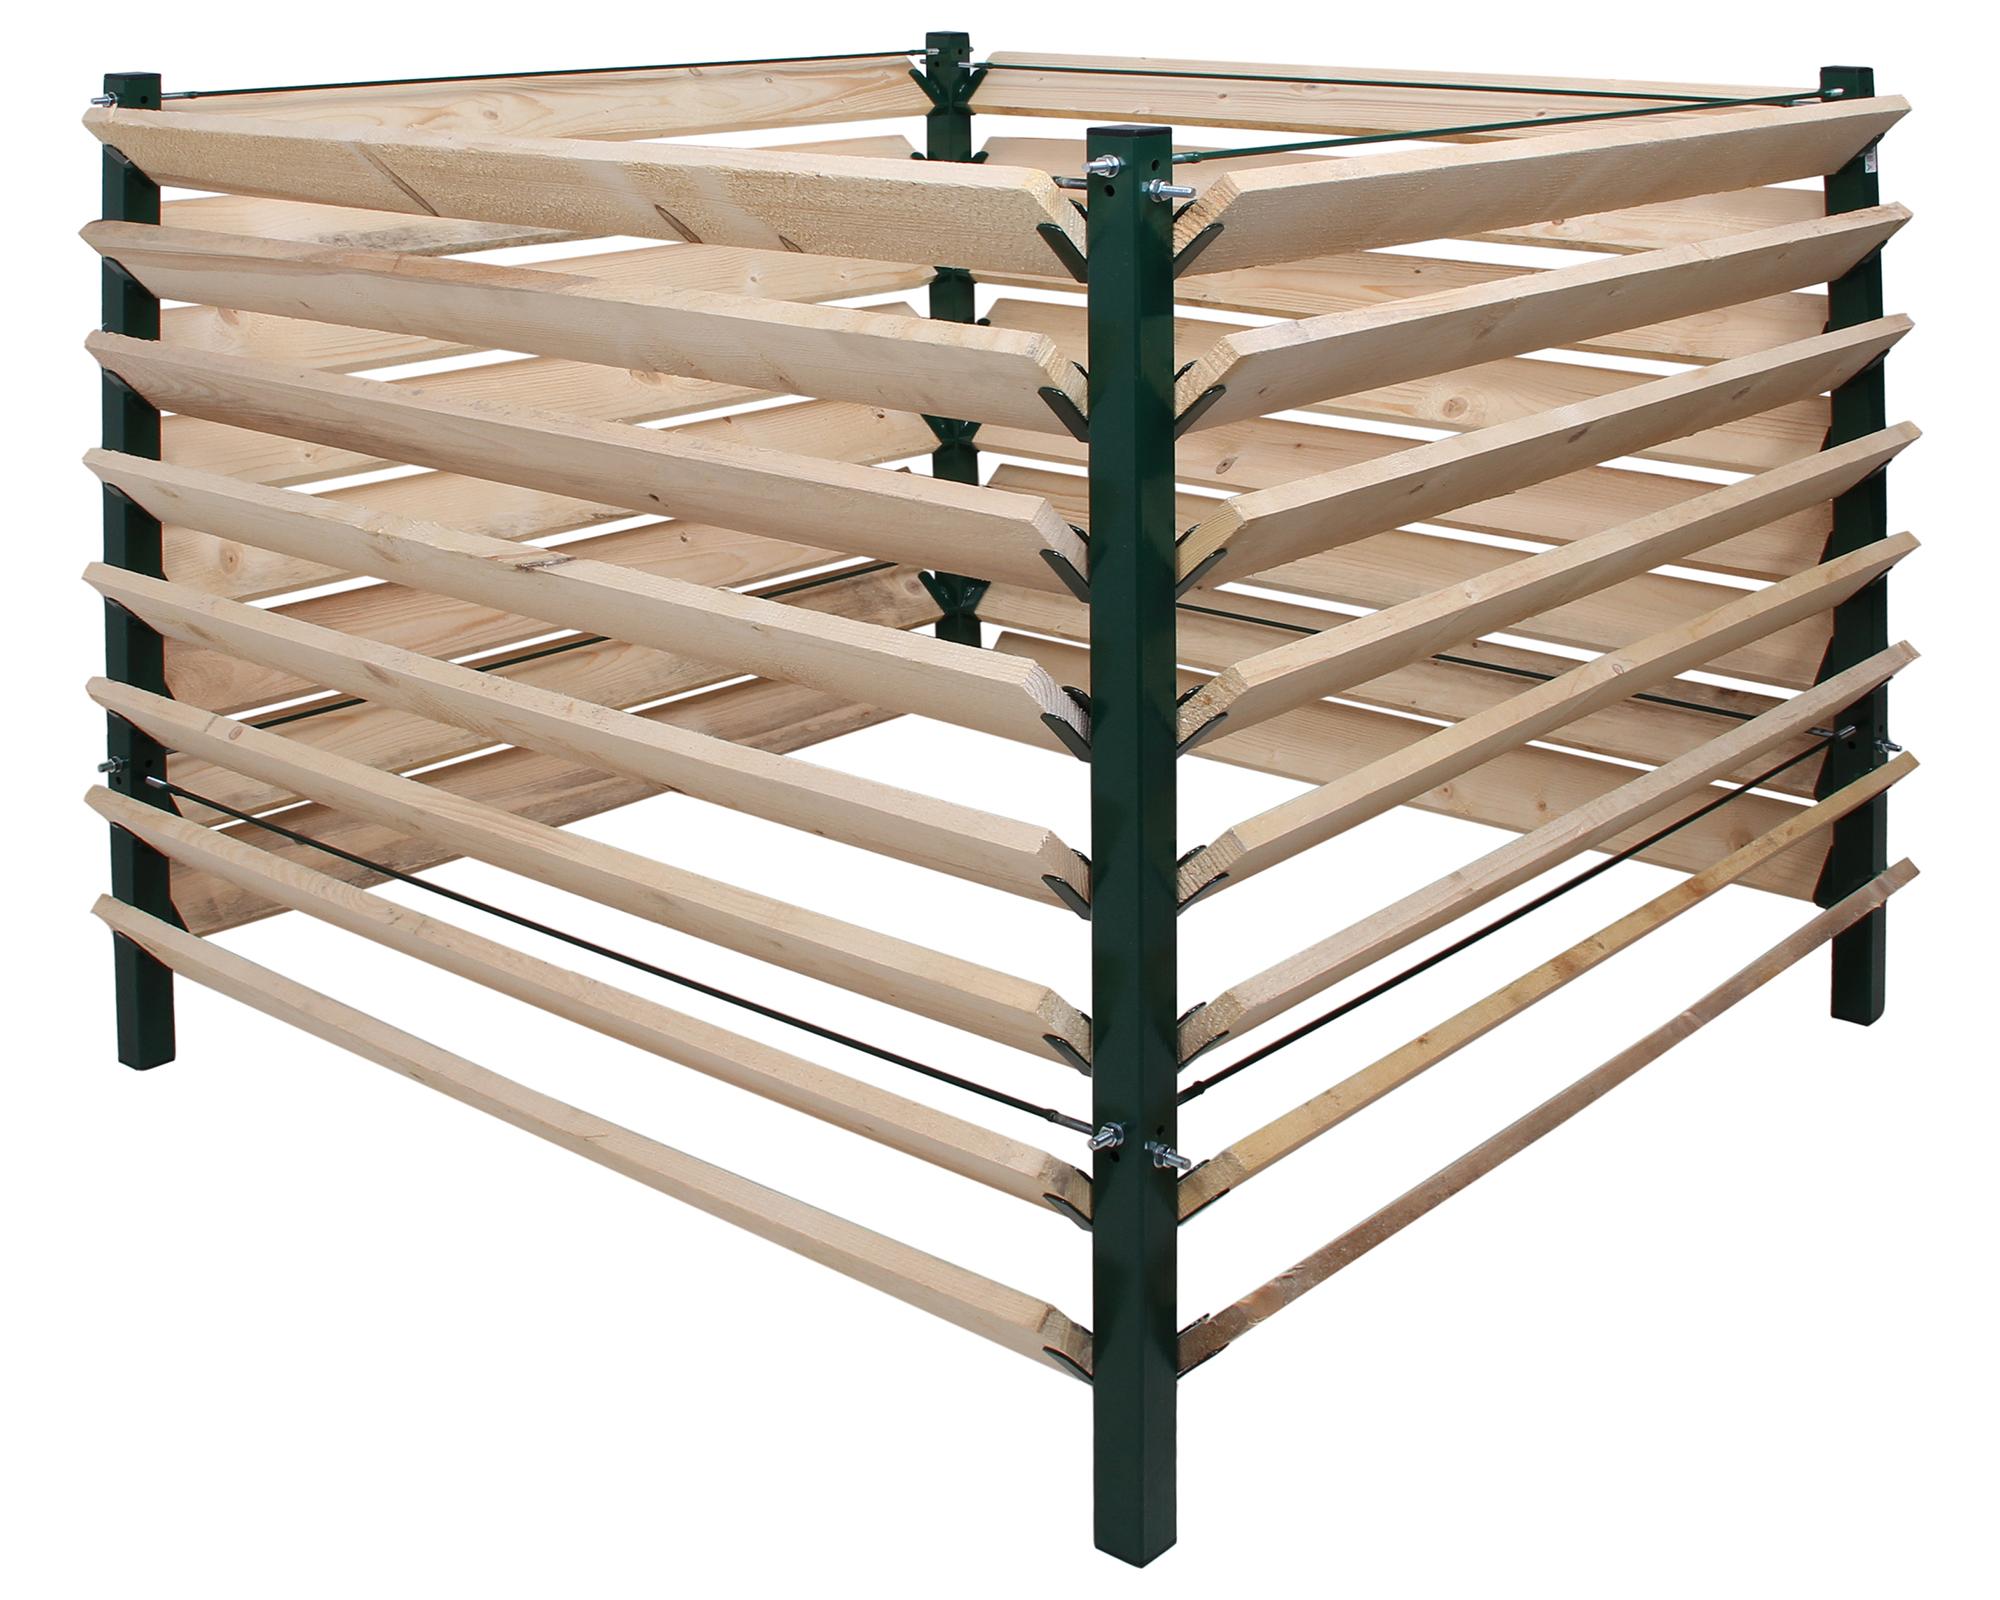 ondis24 komposter kompostsilo avangarde 1300 g nstig. Black Bedroom Furniture Sets. Home Design Ideas